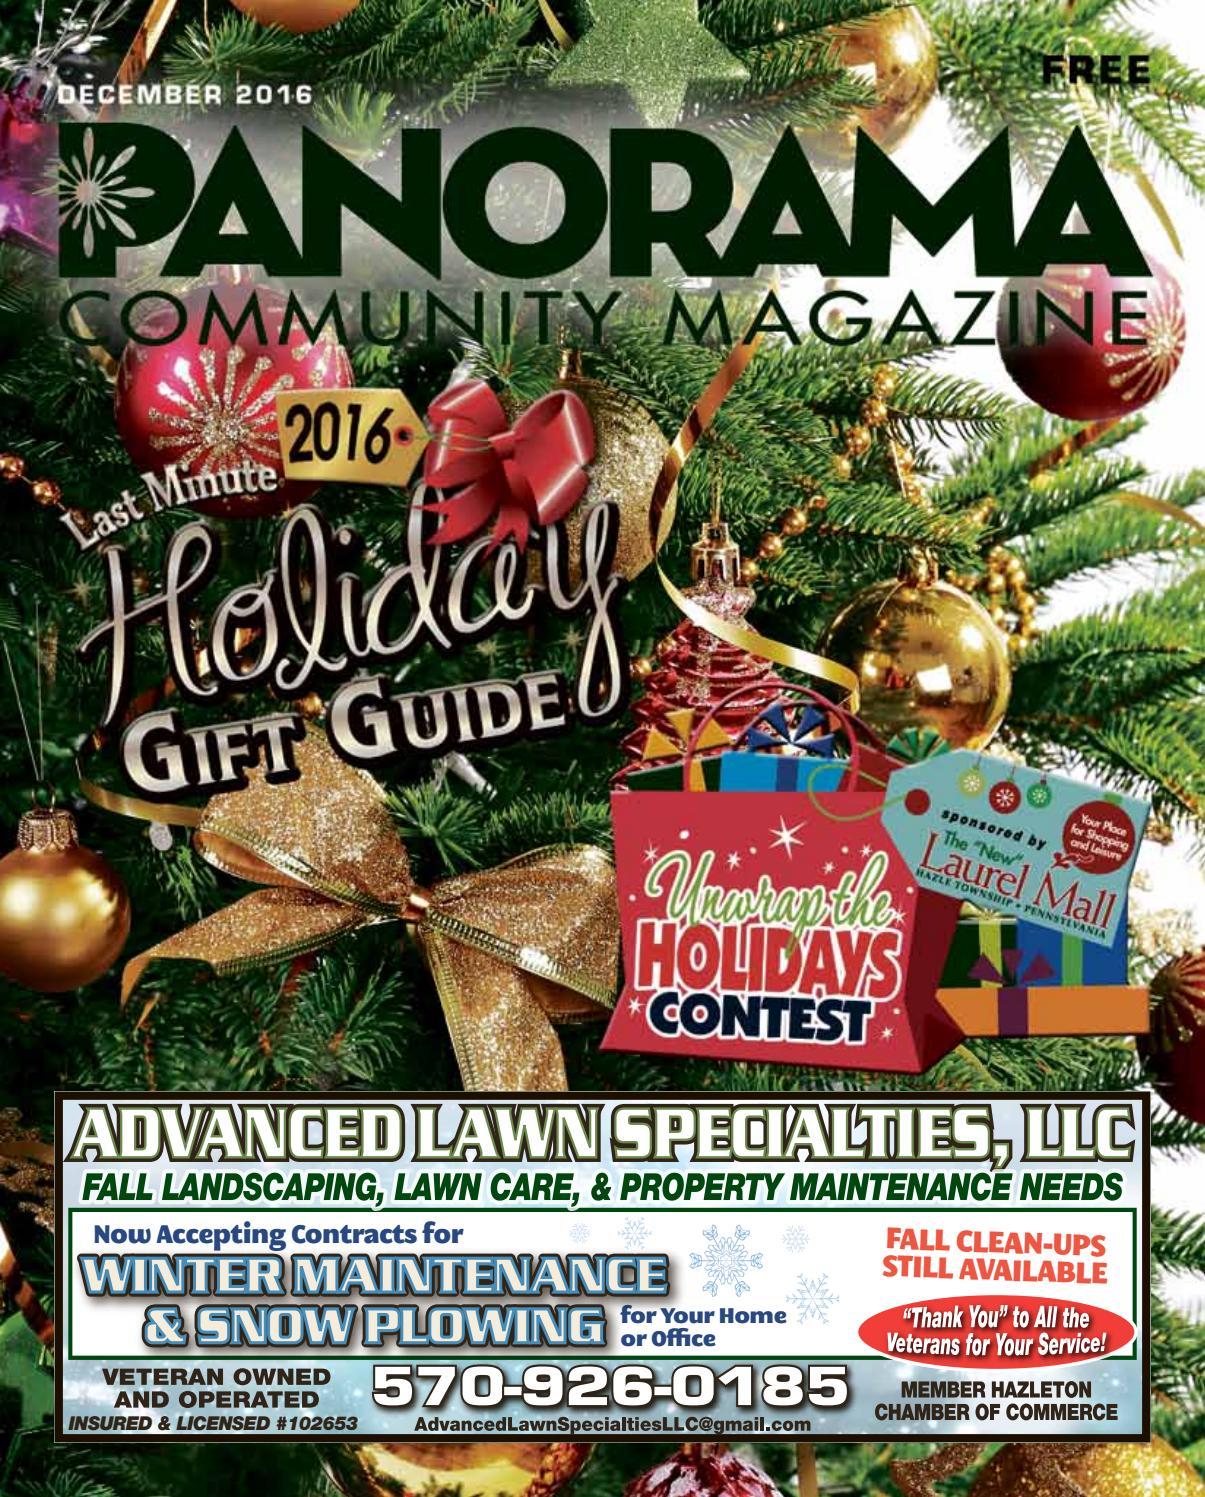 Panorama Community Magazine December 2016 by Panorama